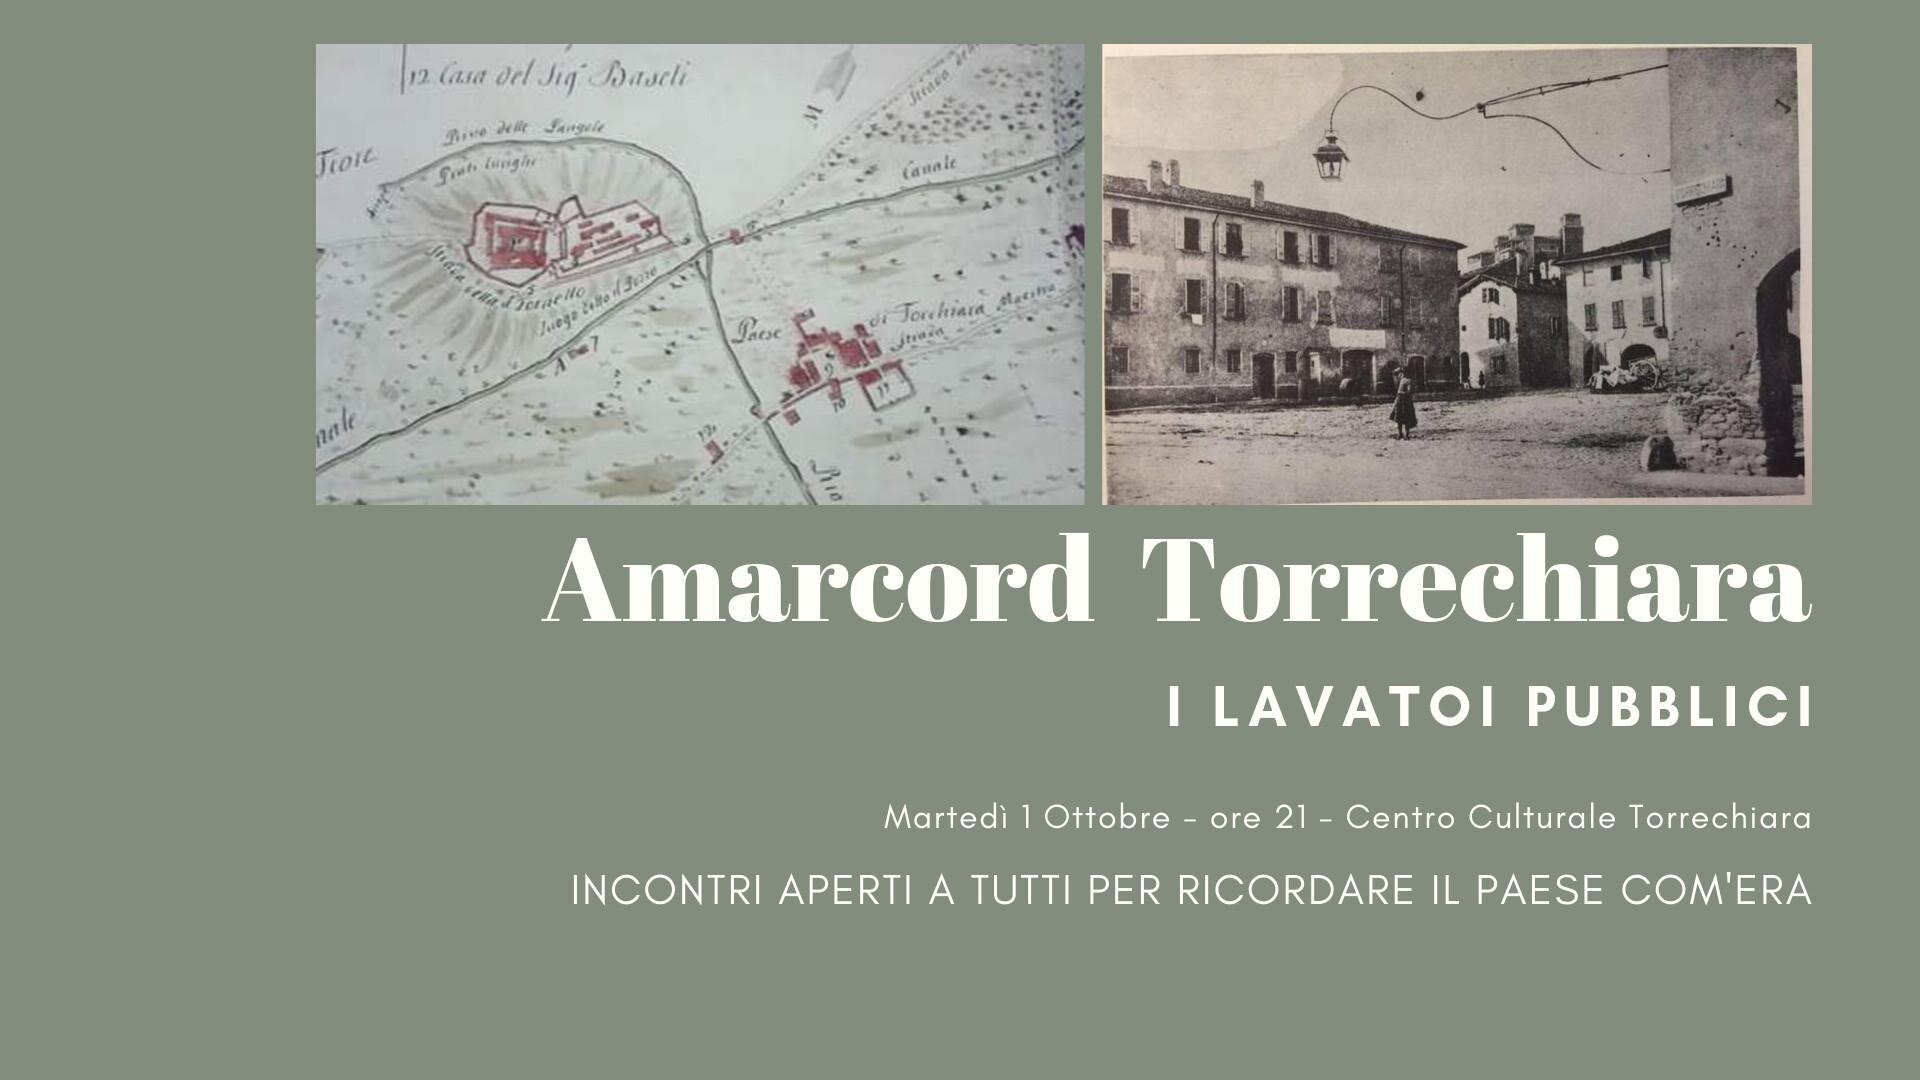 AMARCORD TORRECHIARA: i lavatoi